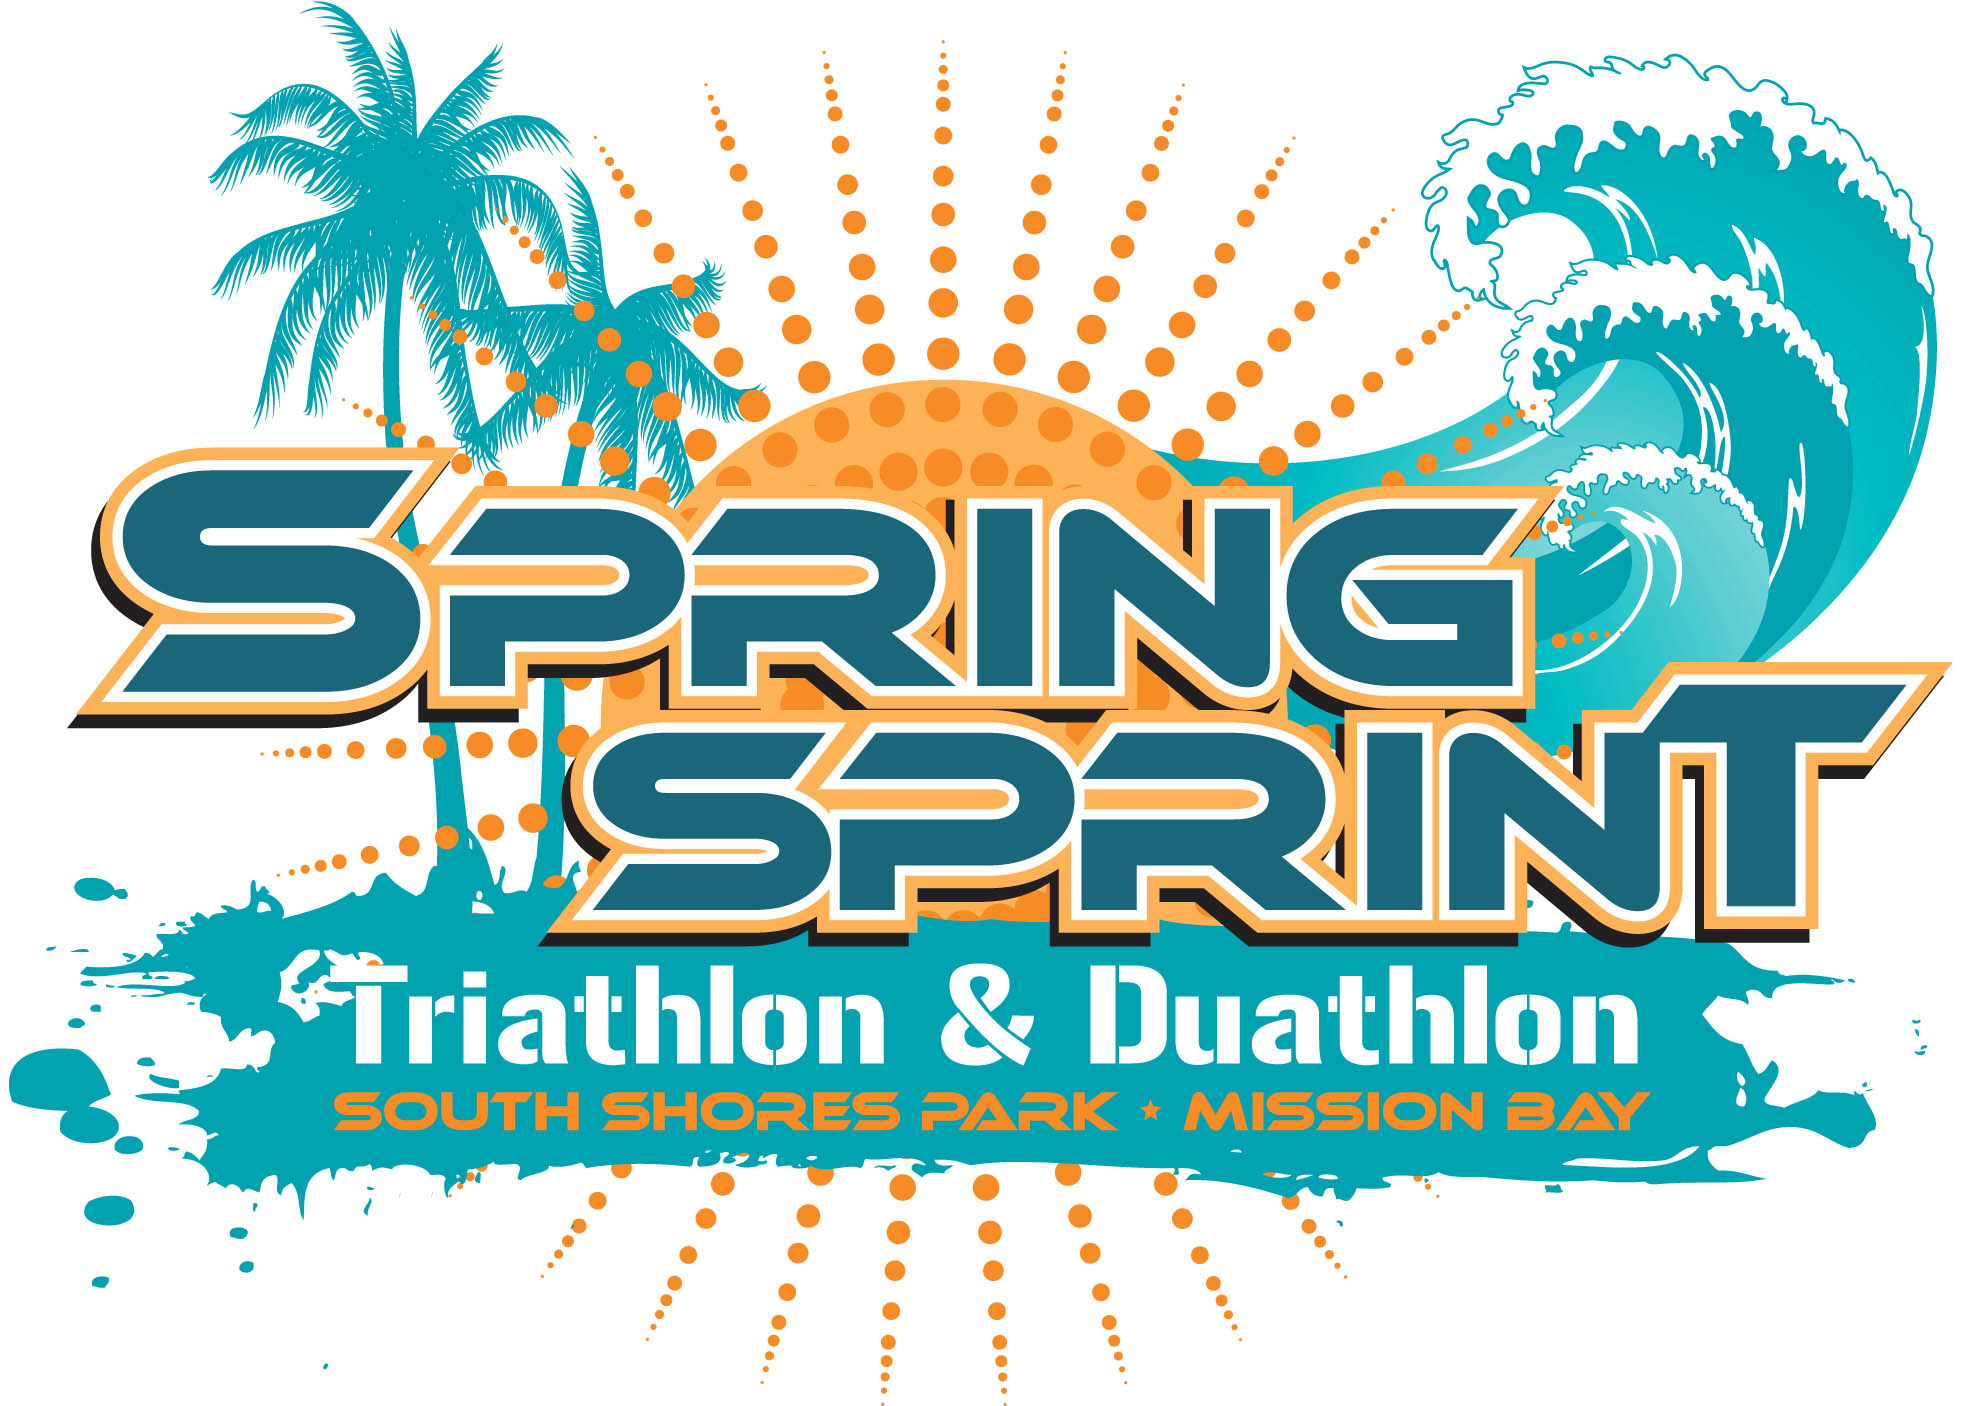 Hasil gambar untuk Sprint Duathlon